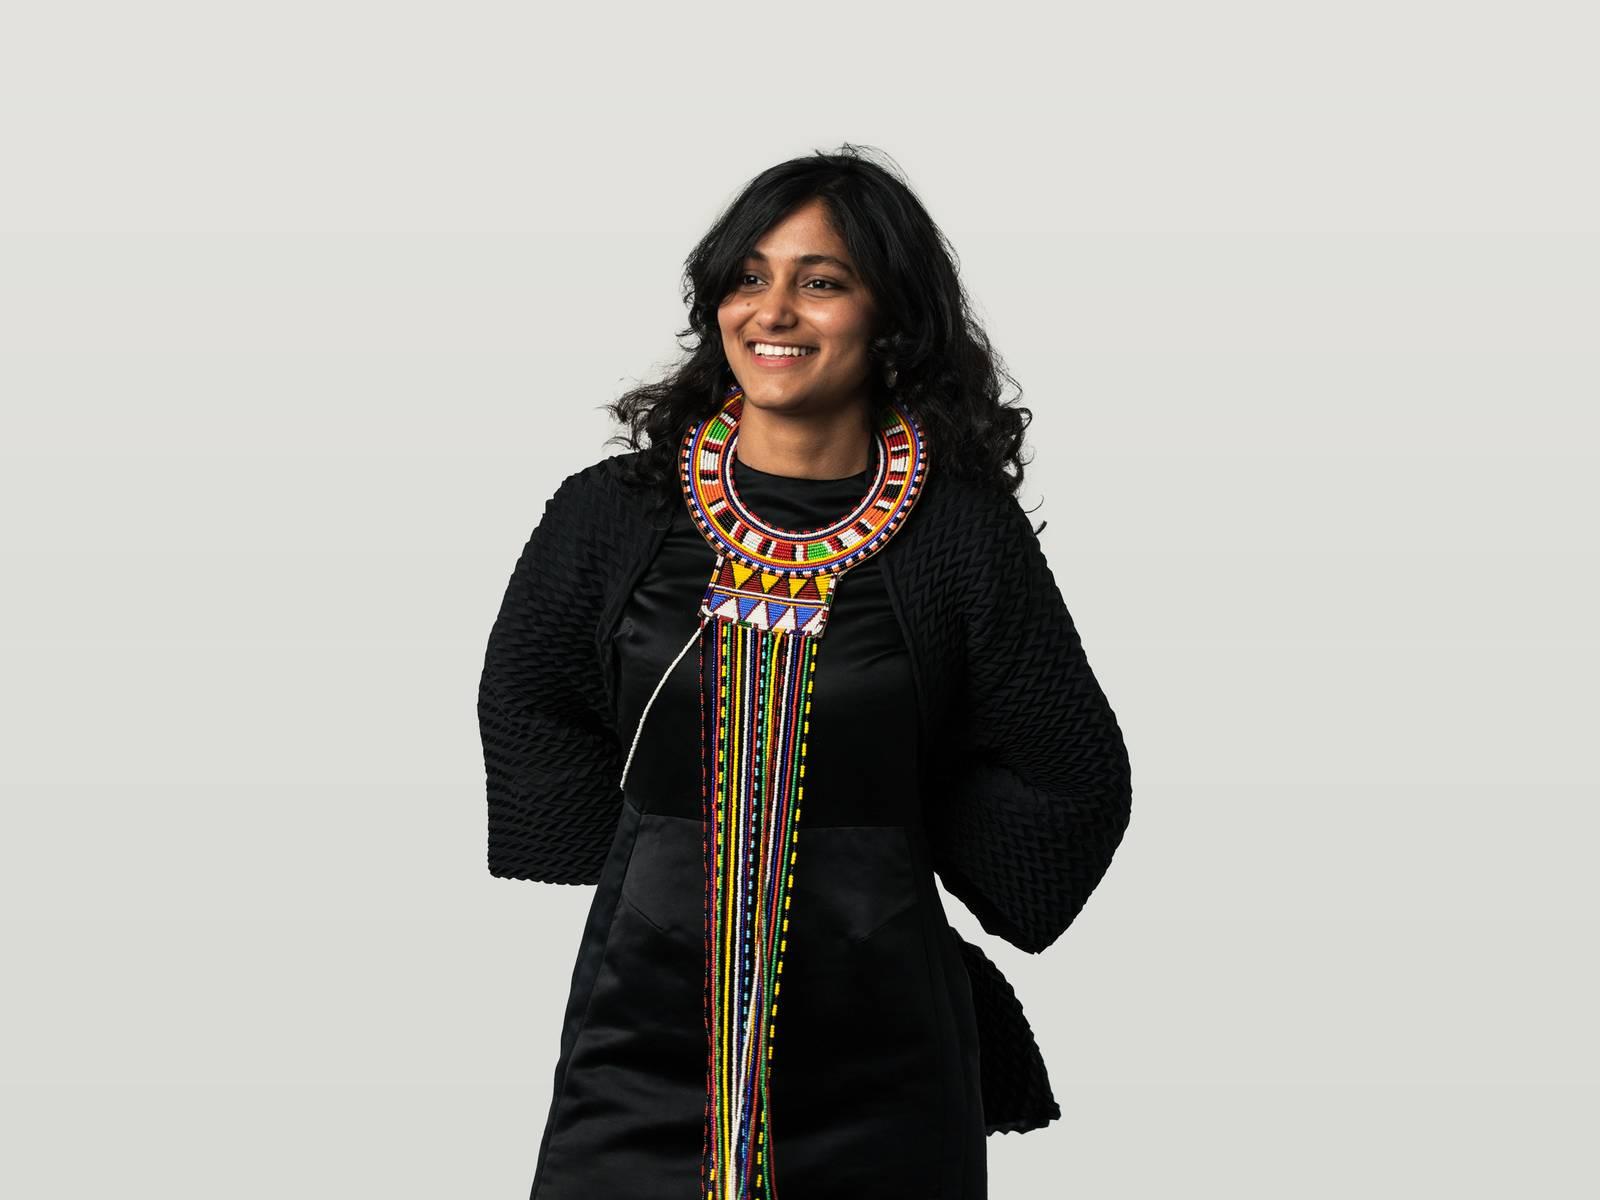 Kanhika, wearing a traditional colourful beaded maasai necklace from Kenya